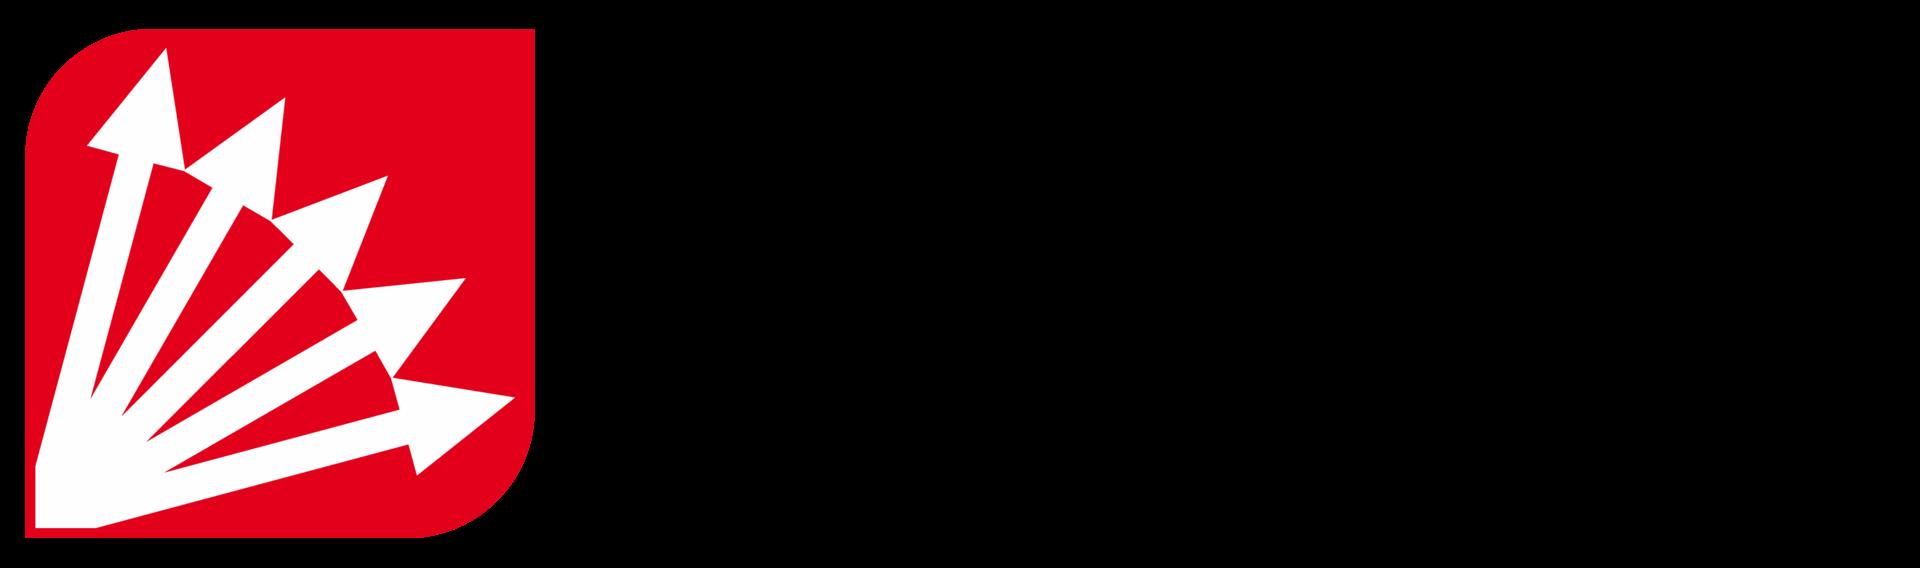 1920px-Falange_Espa%C3%B1ola_de_las_JONS